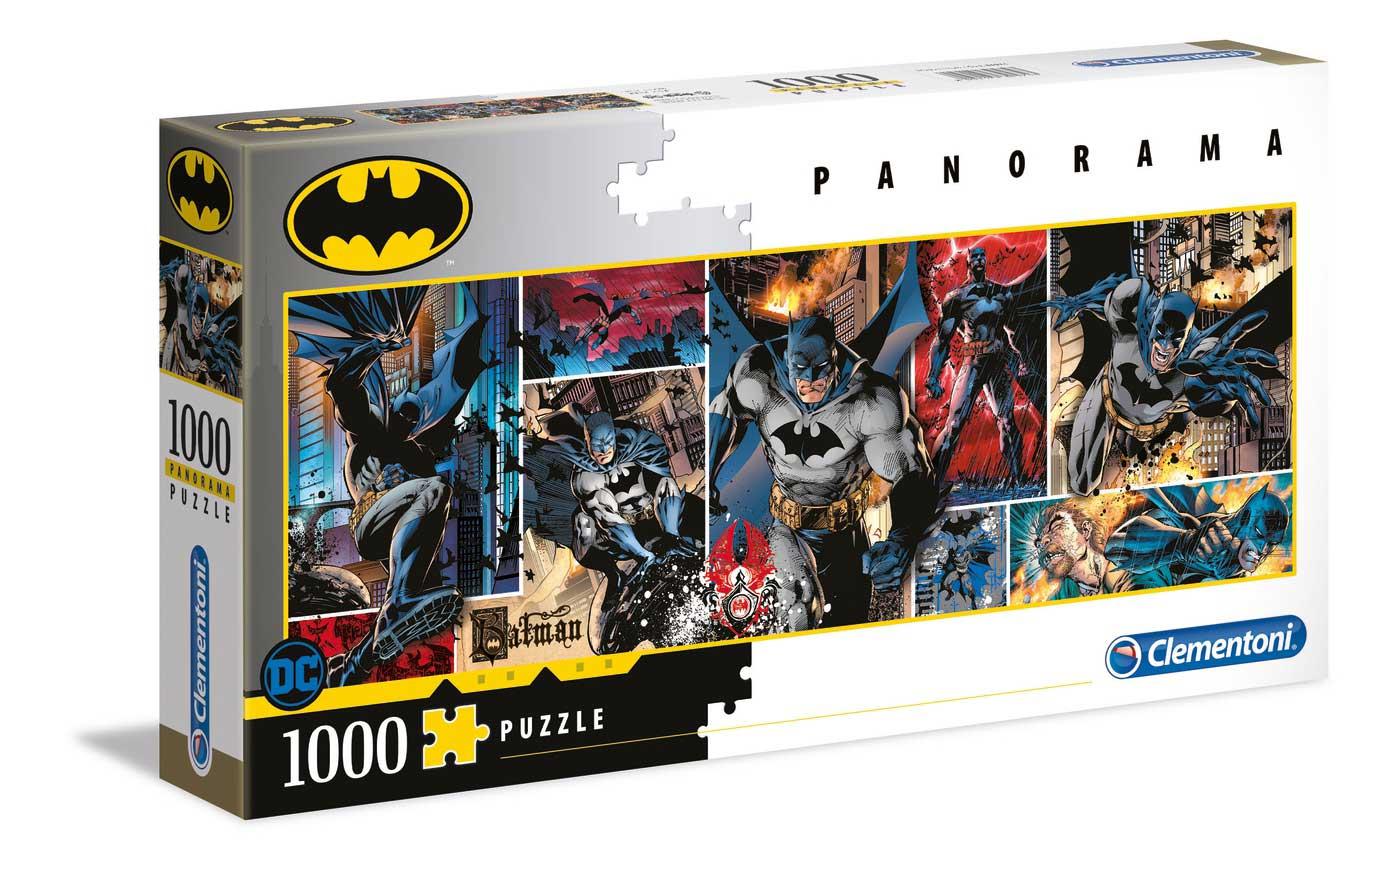 Puzzle Clementoni BATMAN Panorama de 1000 Piezas